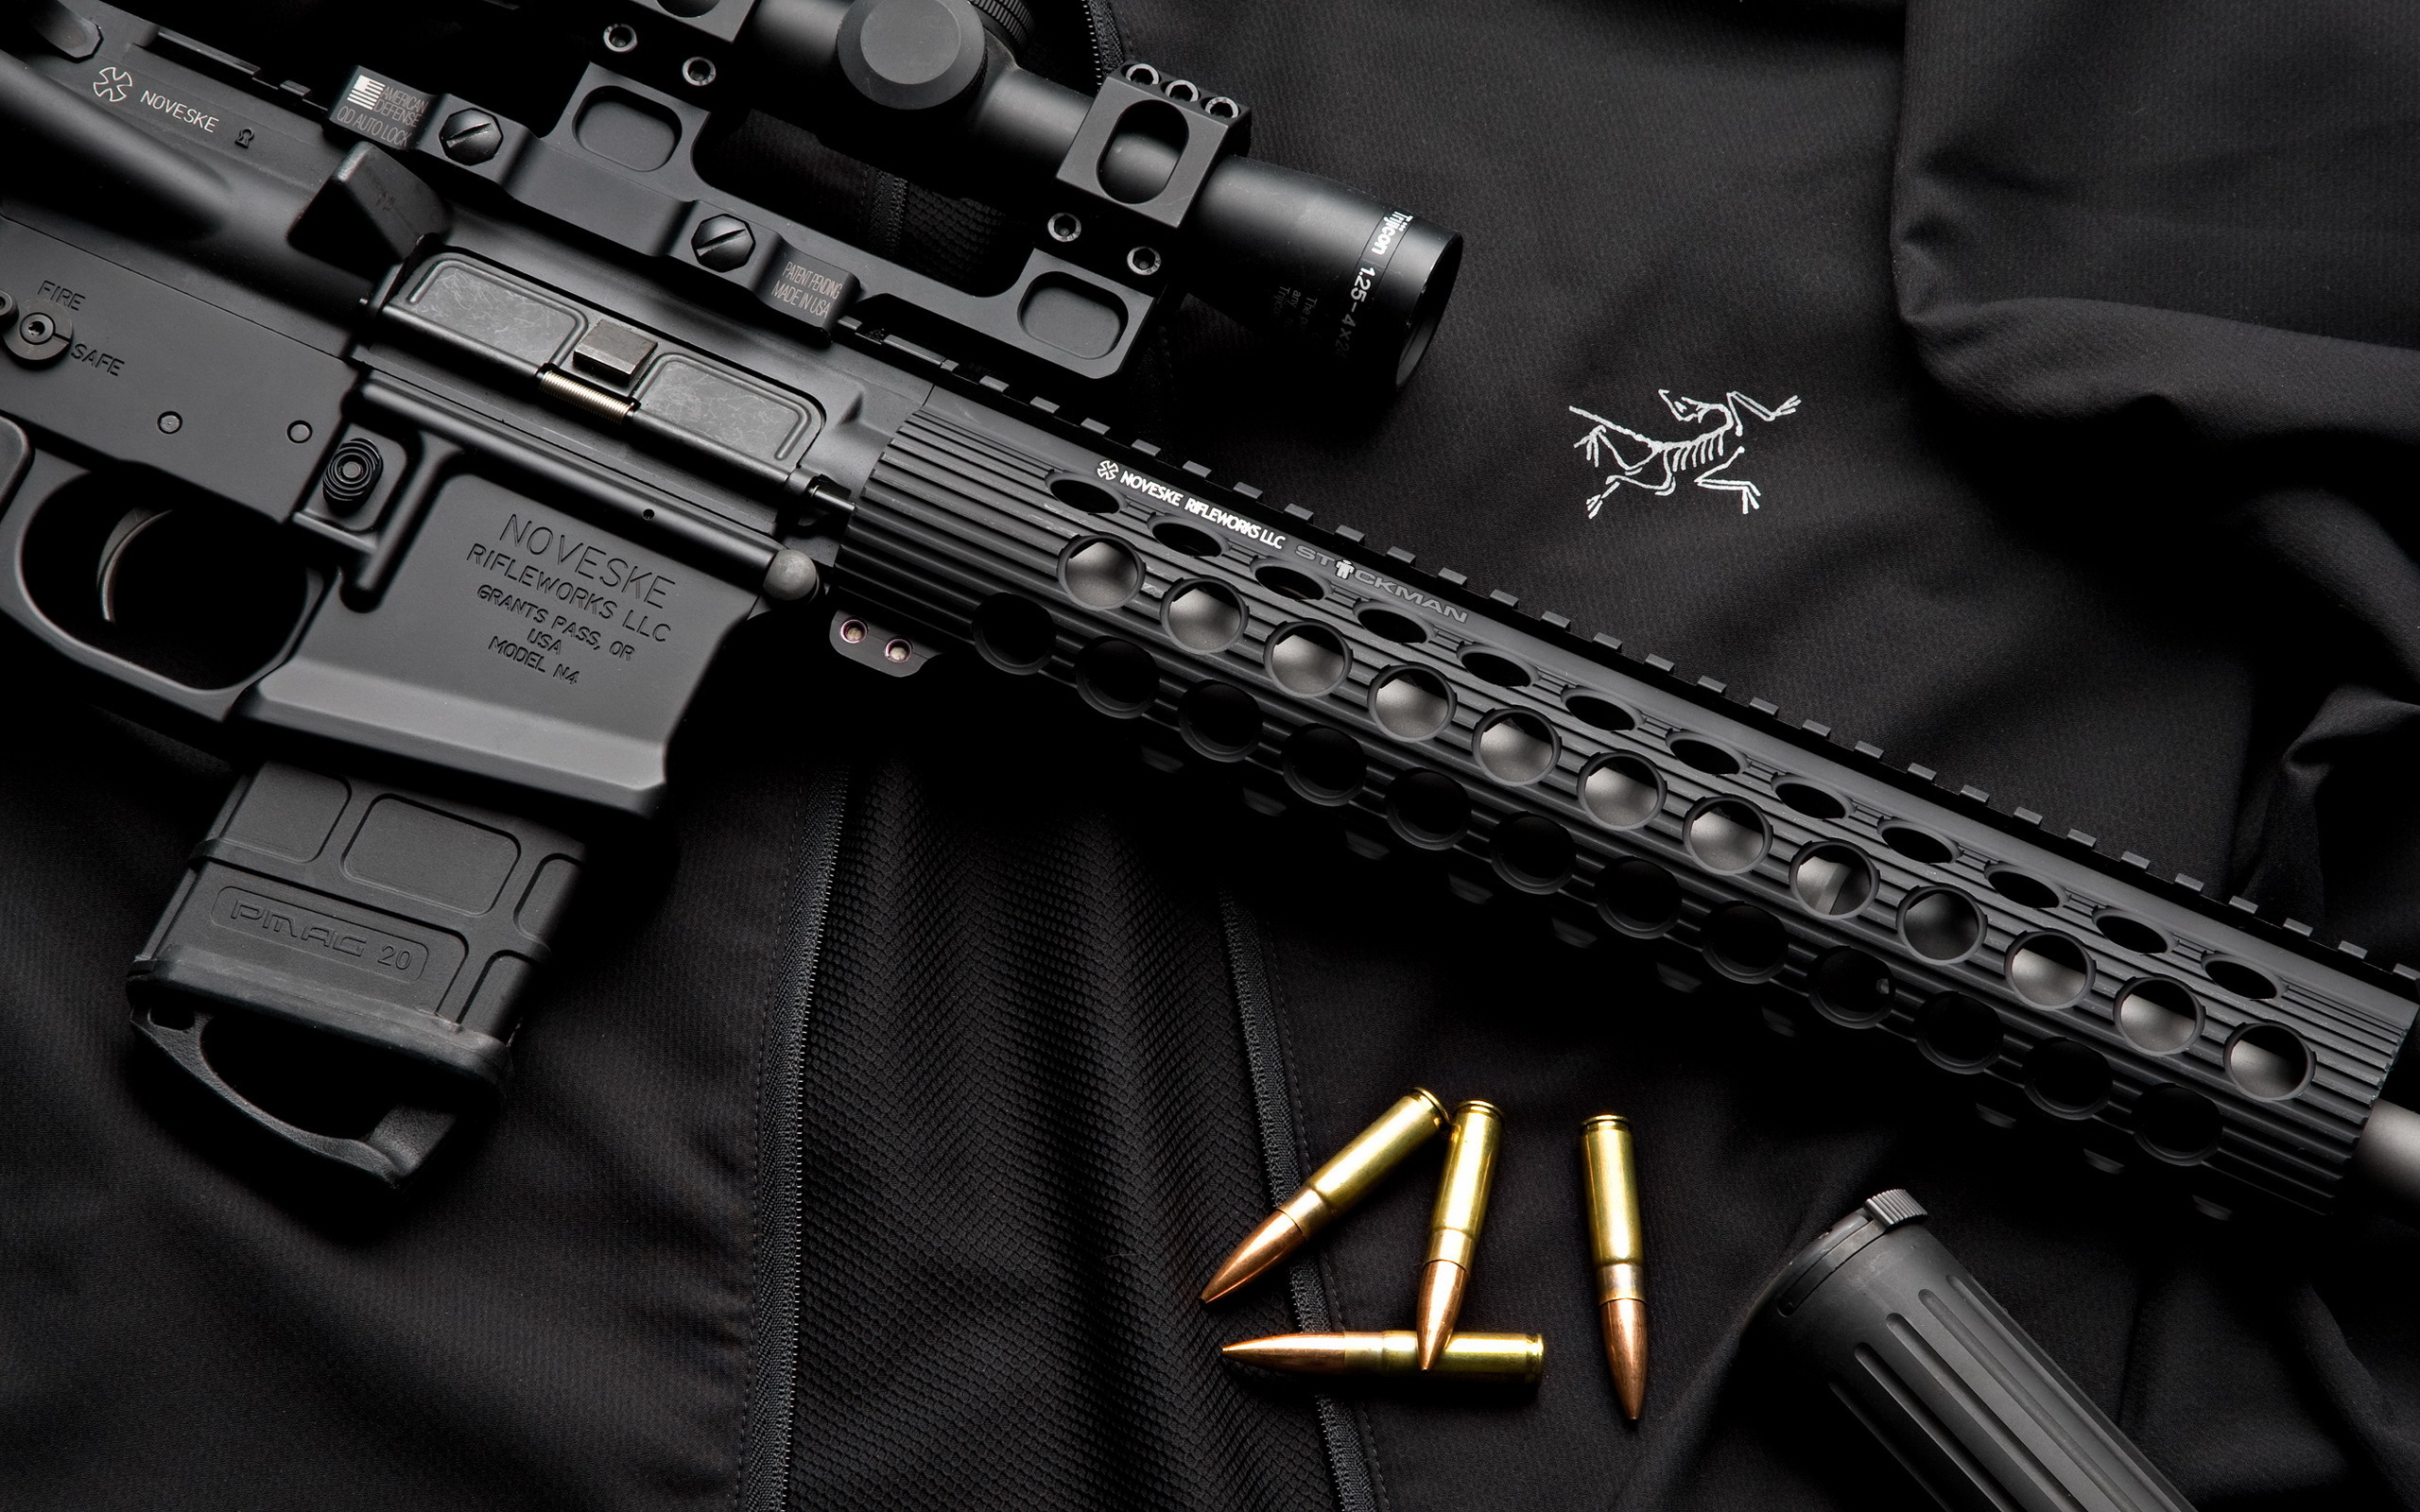 noveske ar 15 gun wallpapers - 2560x1600 - 1157483